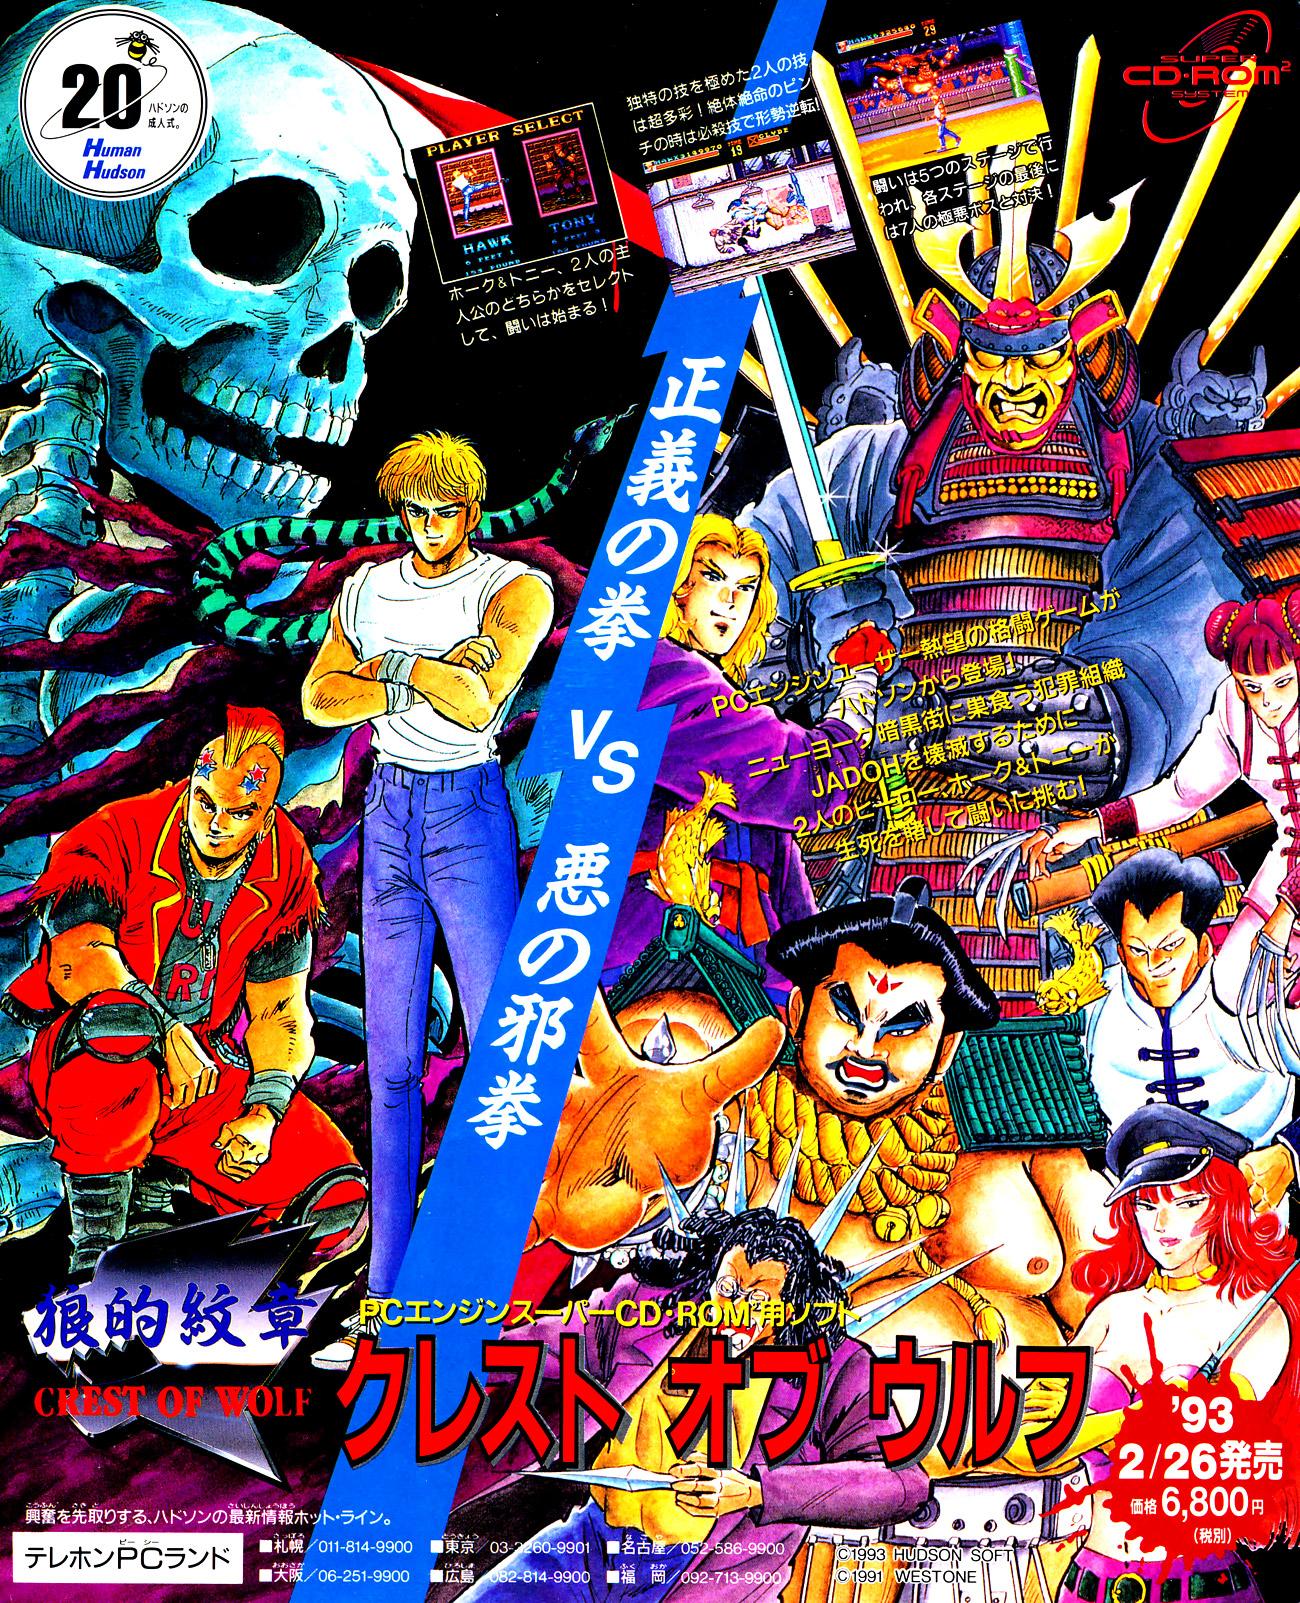 Dengeki PC Engine #04 (April 1993) :: TurboPlay Magazine